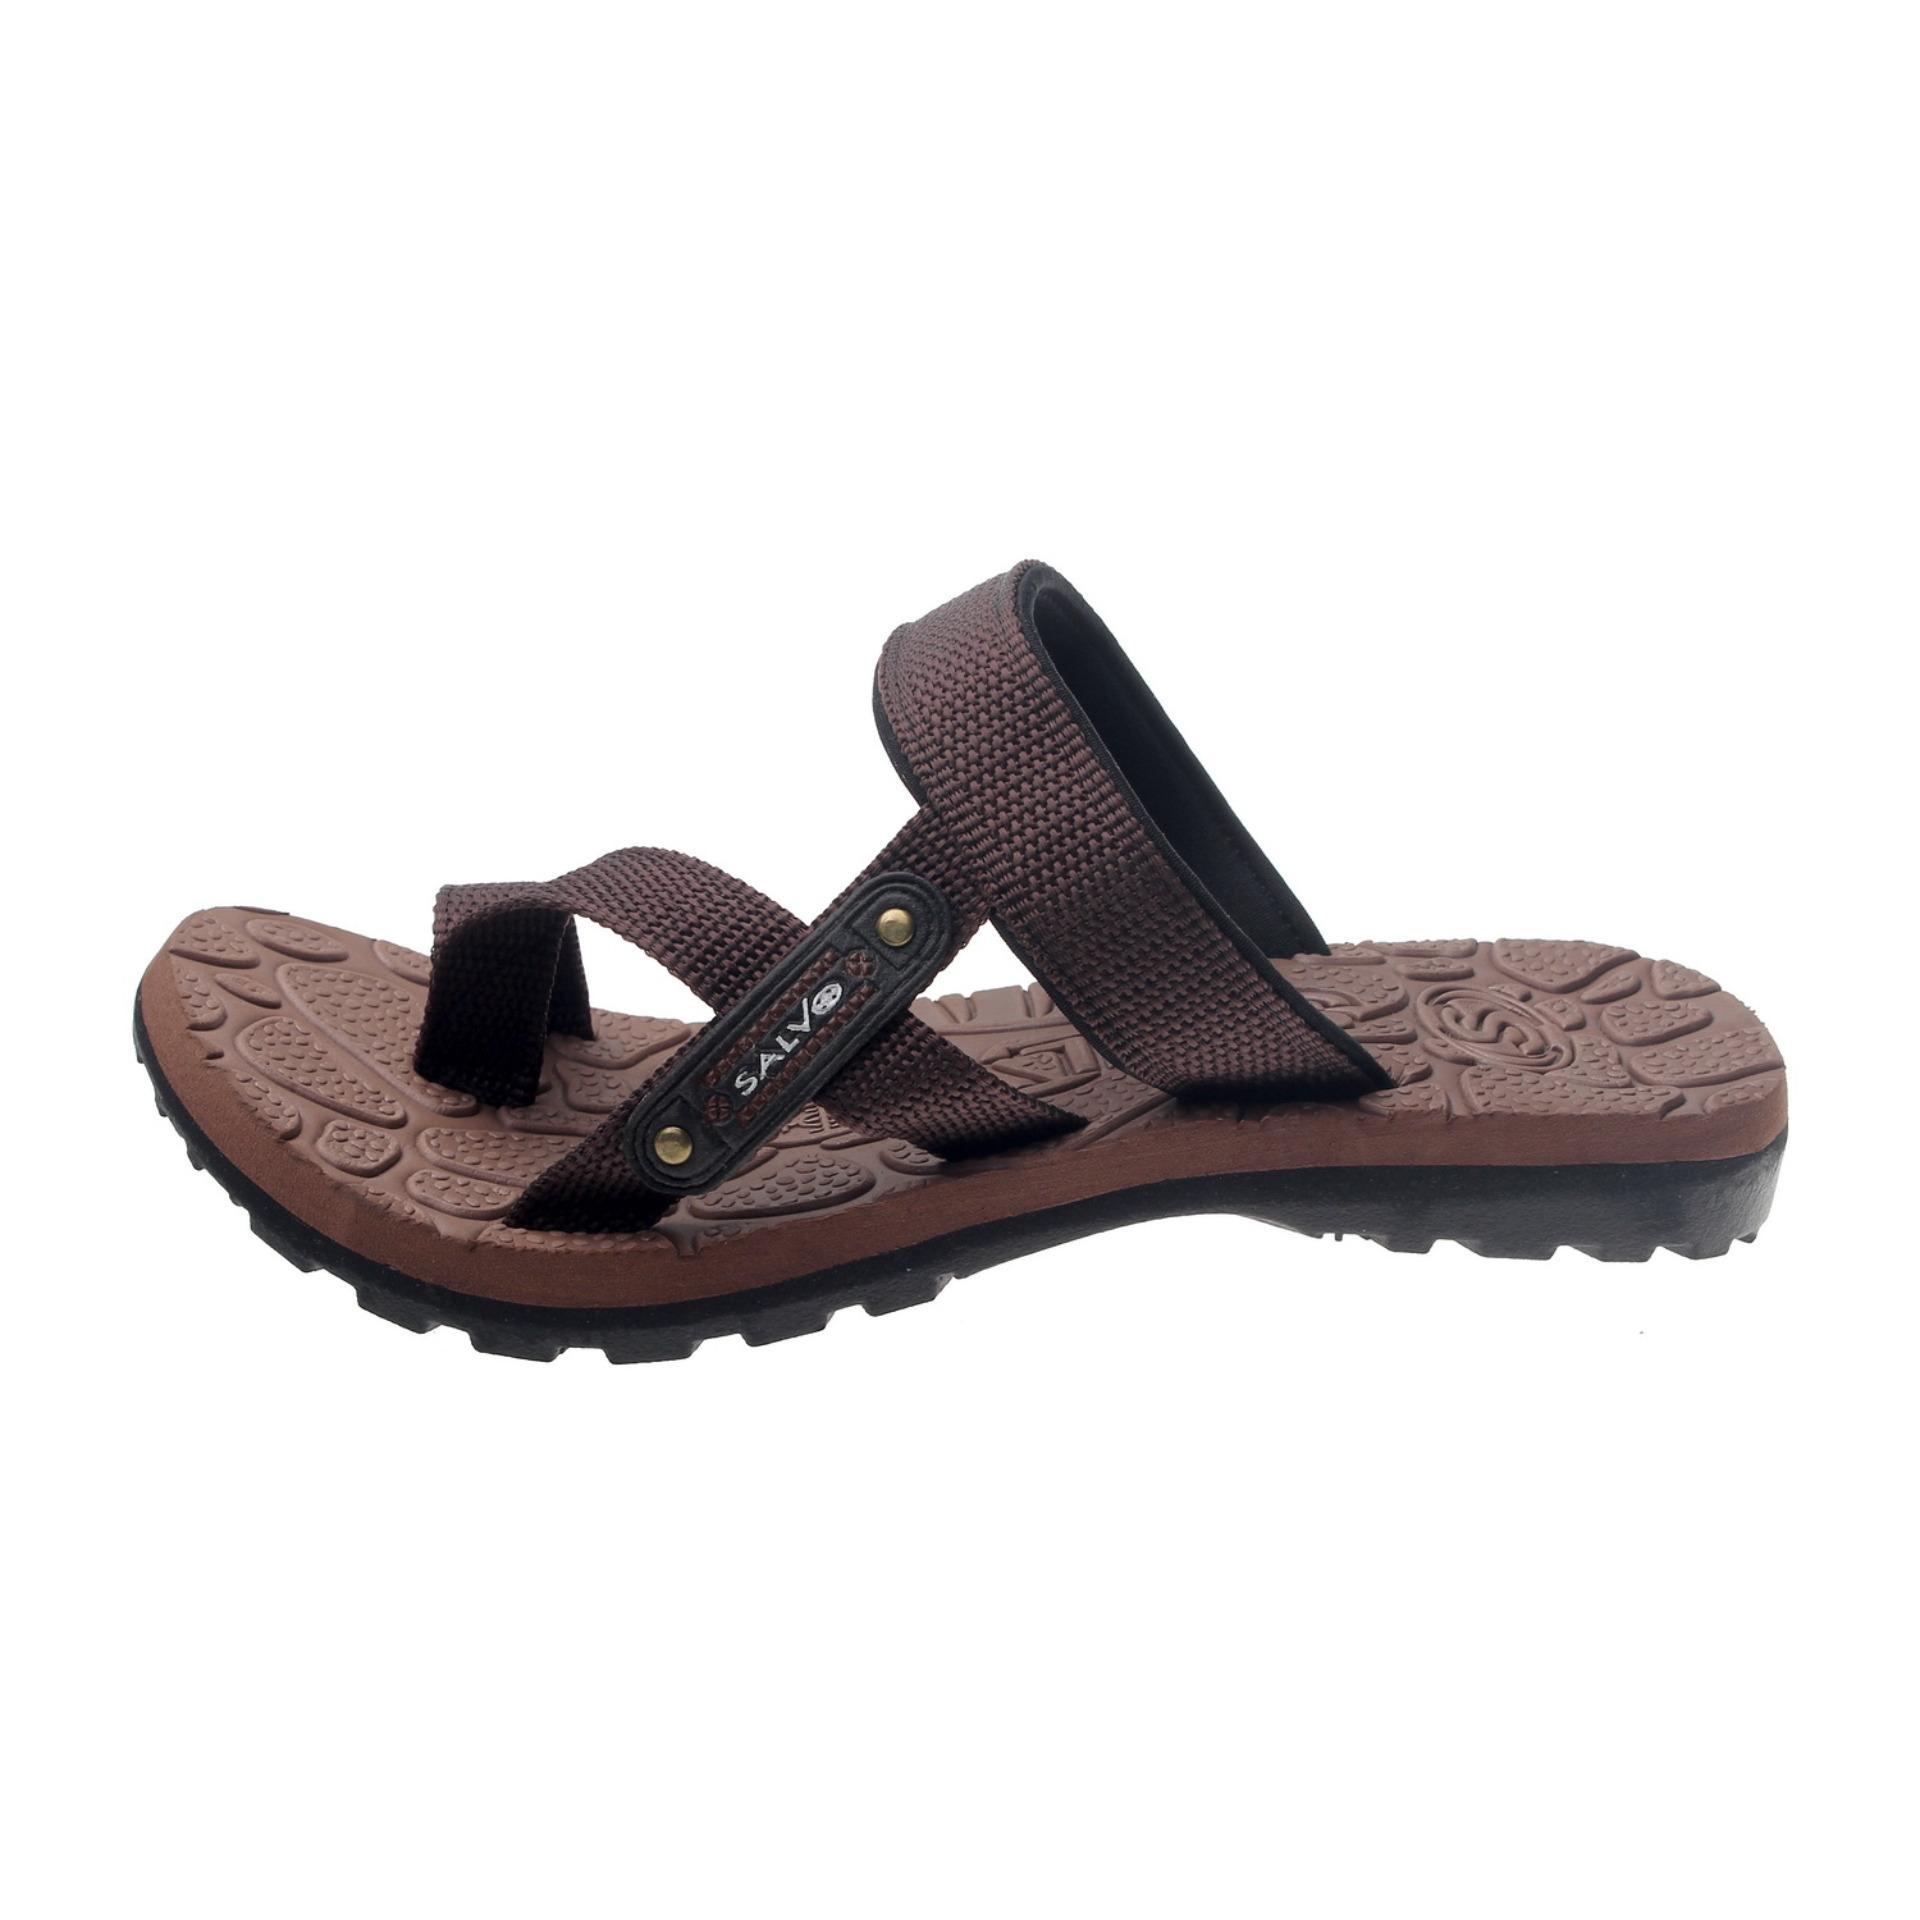 ... Salvo sepatu sneaker denim ST coklat free SG01 coklat ...